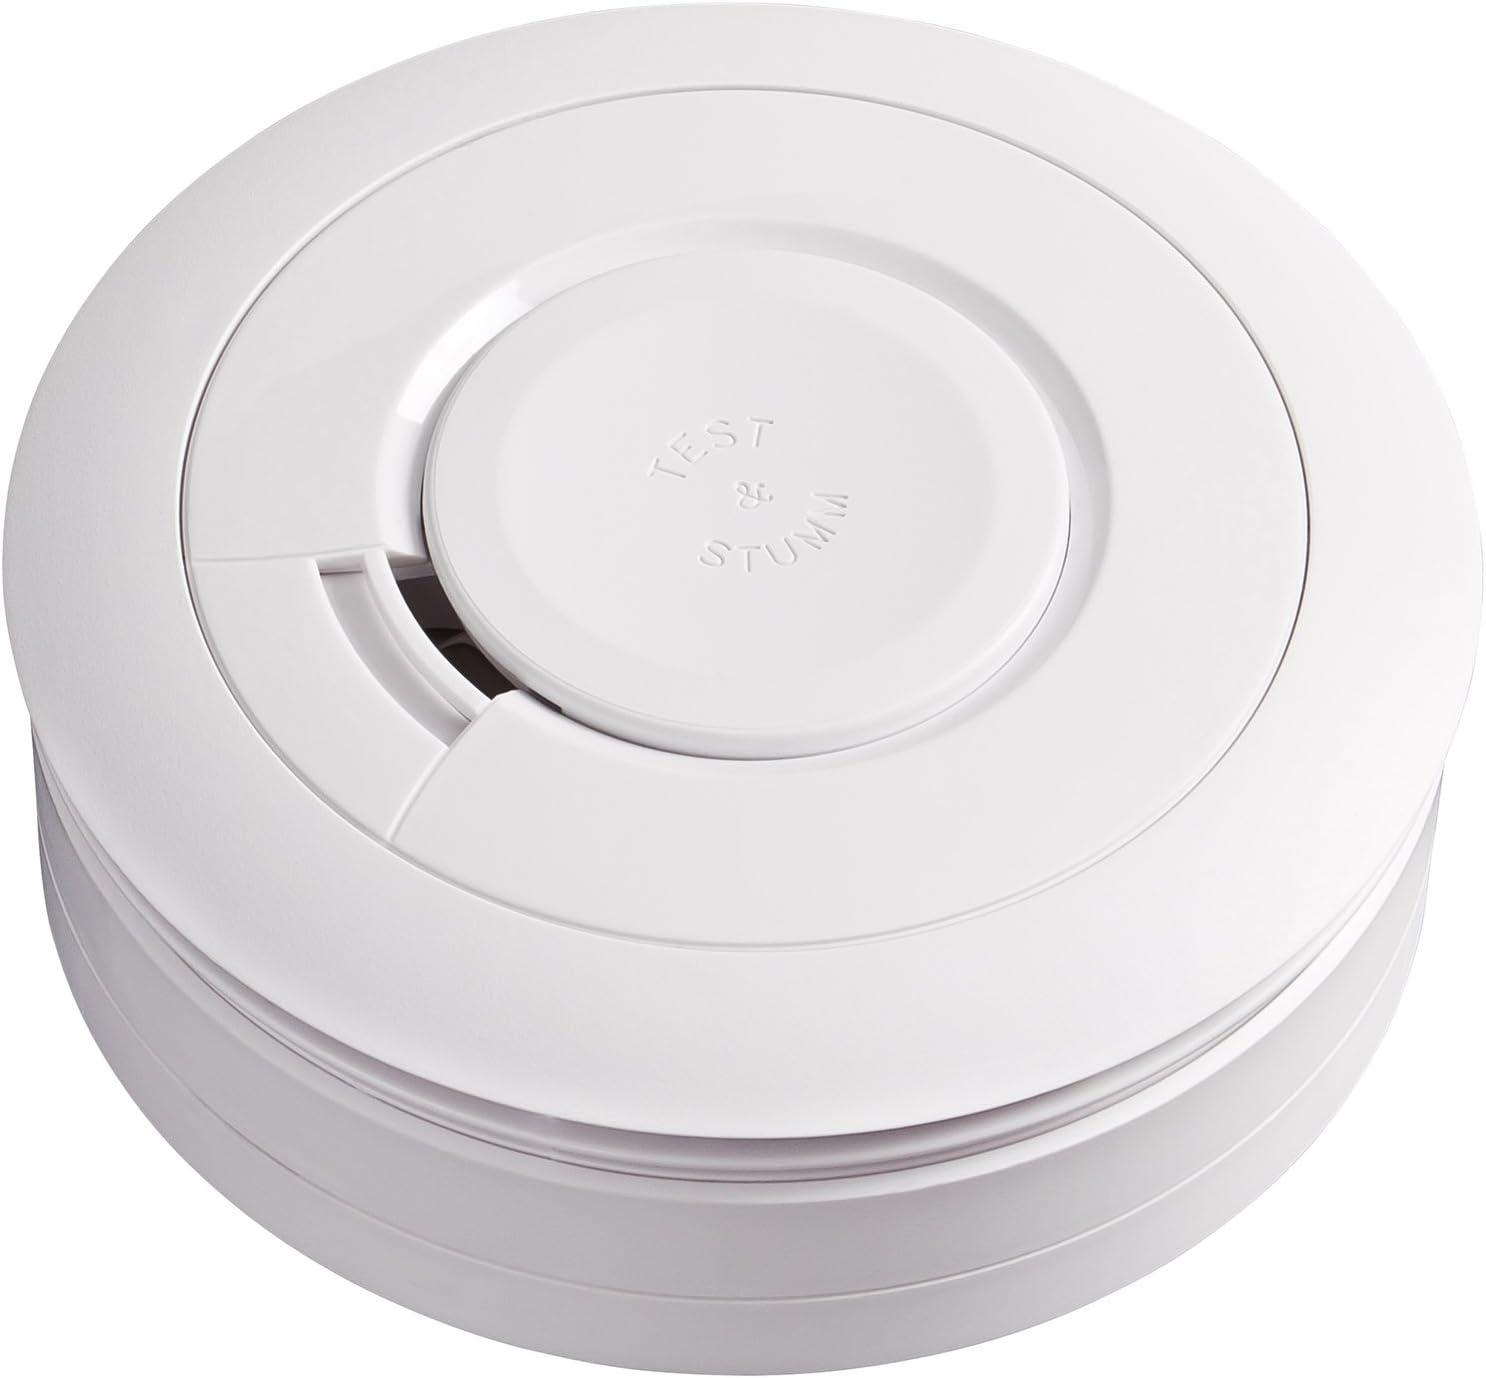 Ei Electronics Aico Ei605CRF Optical Smoke Fire Alarm with 9V Battery RF Module